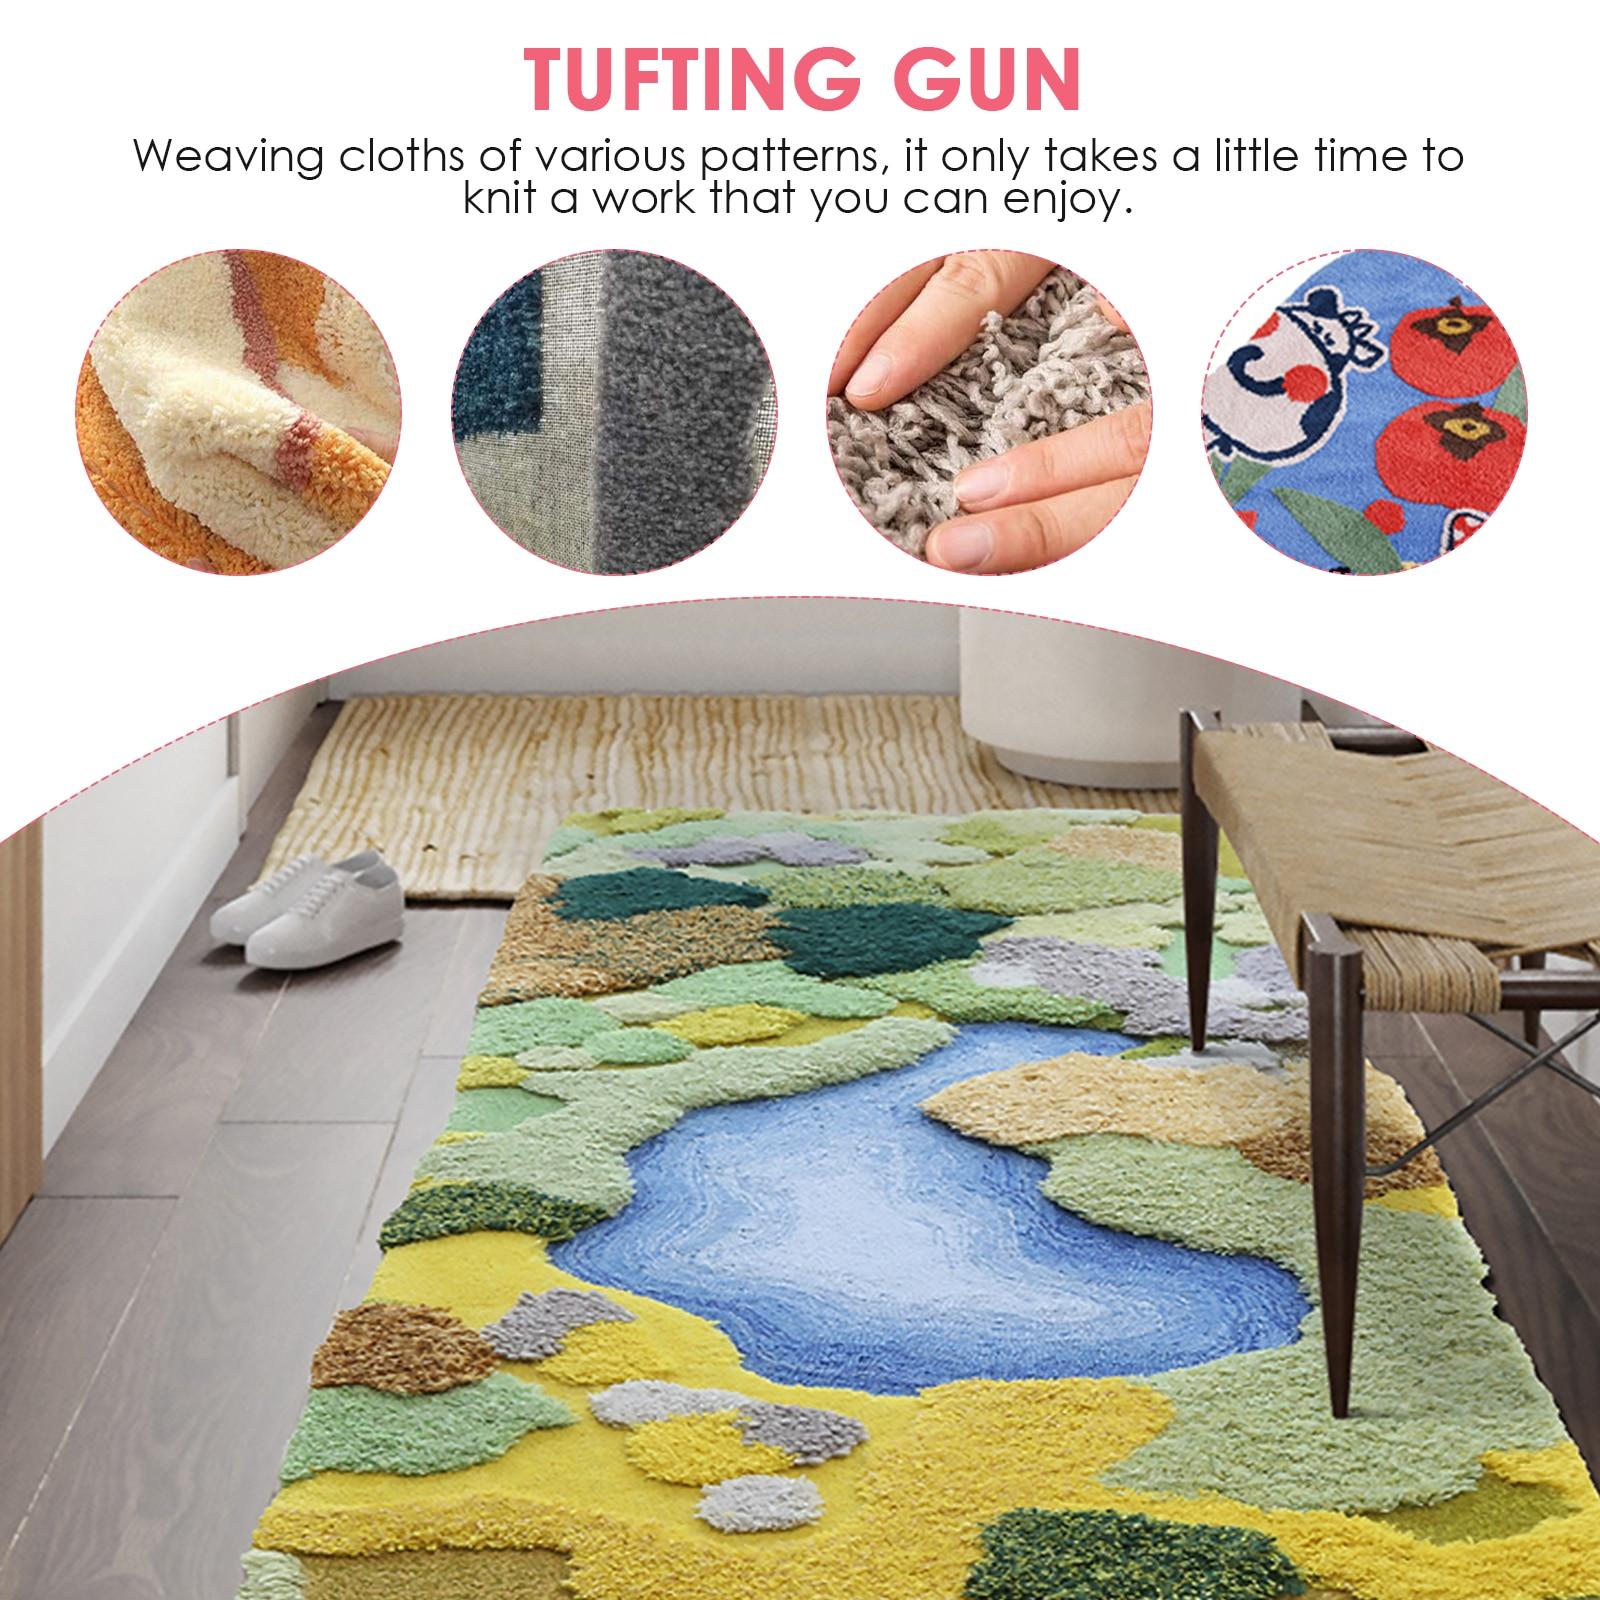 2IN1 Electric Carpet Tufting Gun Rug Kniting Machine Cut Pile and Loop Pile Hand Gun Industrial Carpet Weaving Flocking Machines enlarge